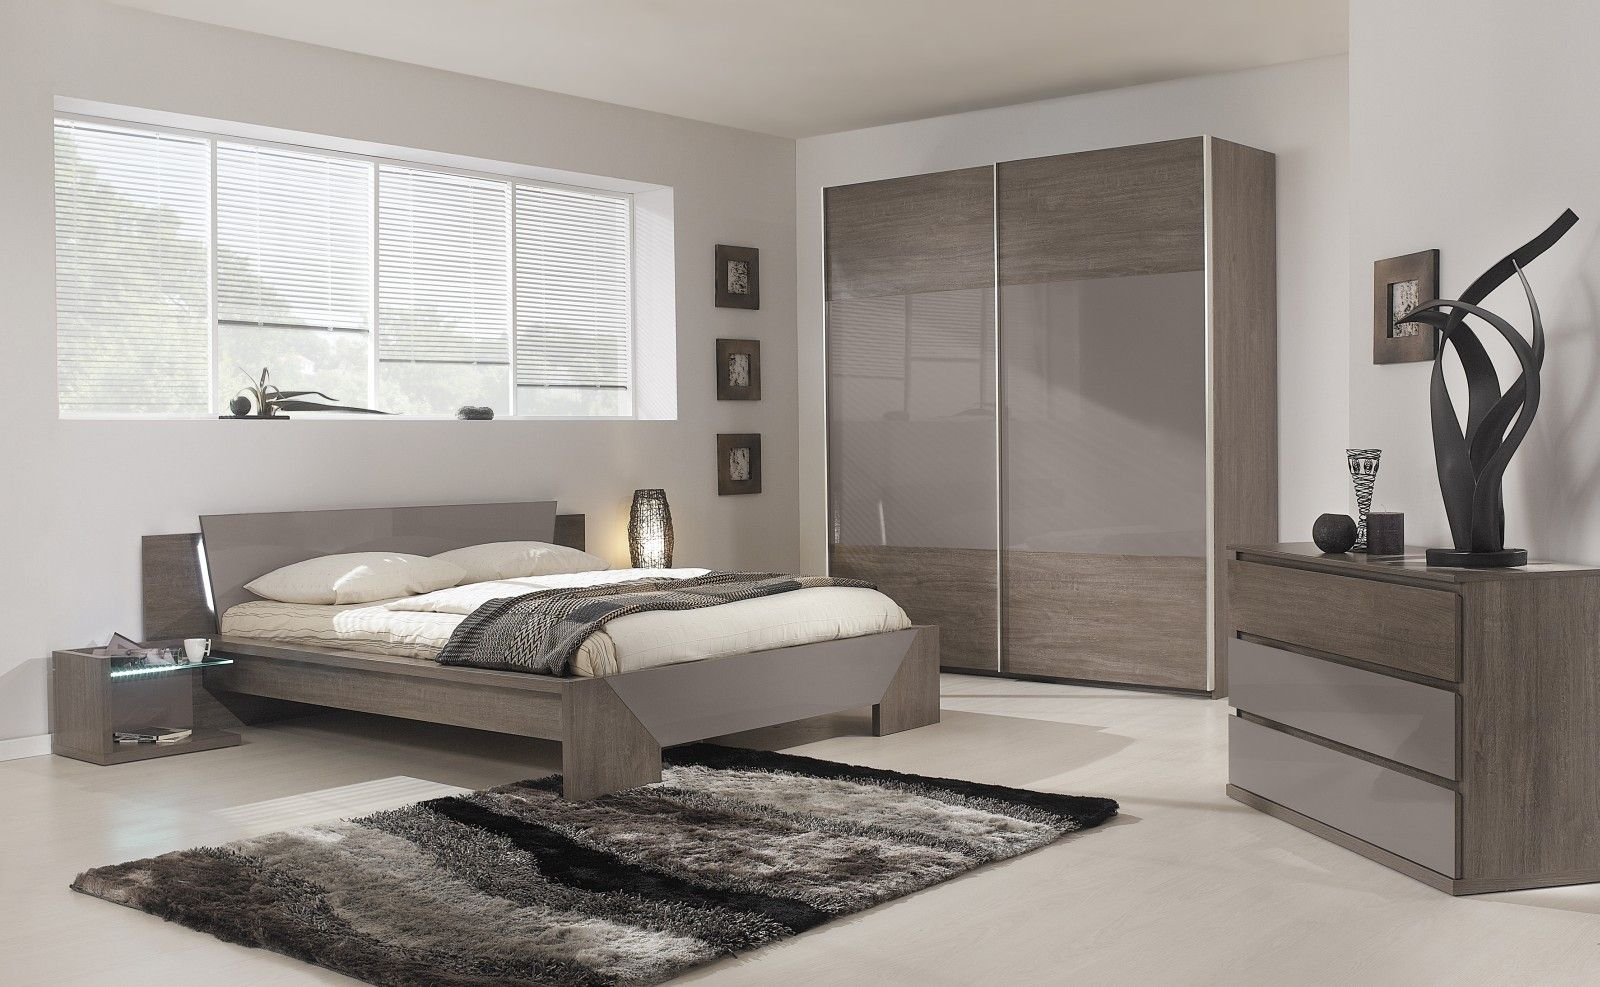 Bedroom Furniture Grey Hemnes 8 Drawer Dresser Gray Dark Gray Stained 63x37 3 8 Ikea Grey Bedroom Furniture Ikea Hemnes Dresser 8 Drawer Dresser Simple Designs In Oak And Other